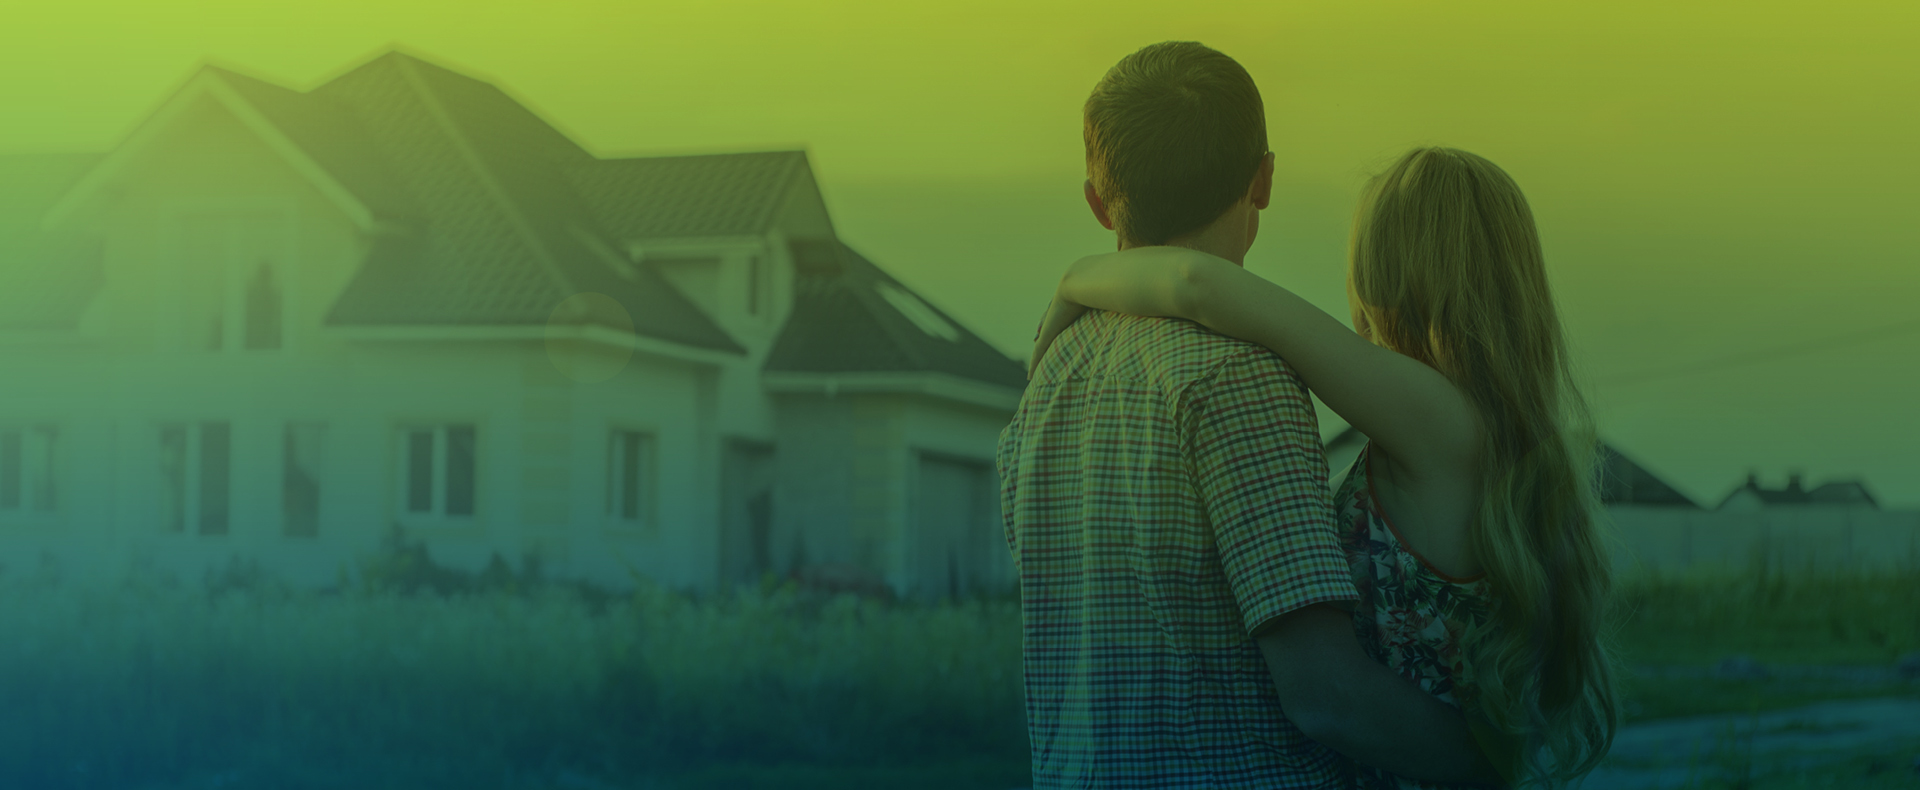 mortgage-background